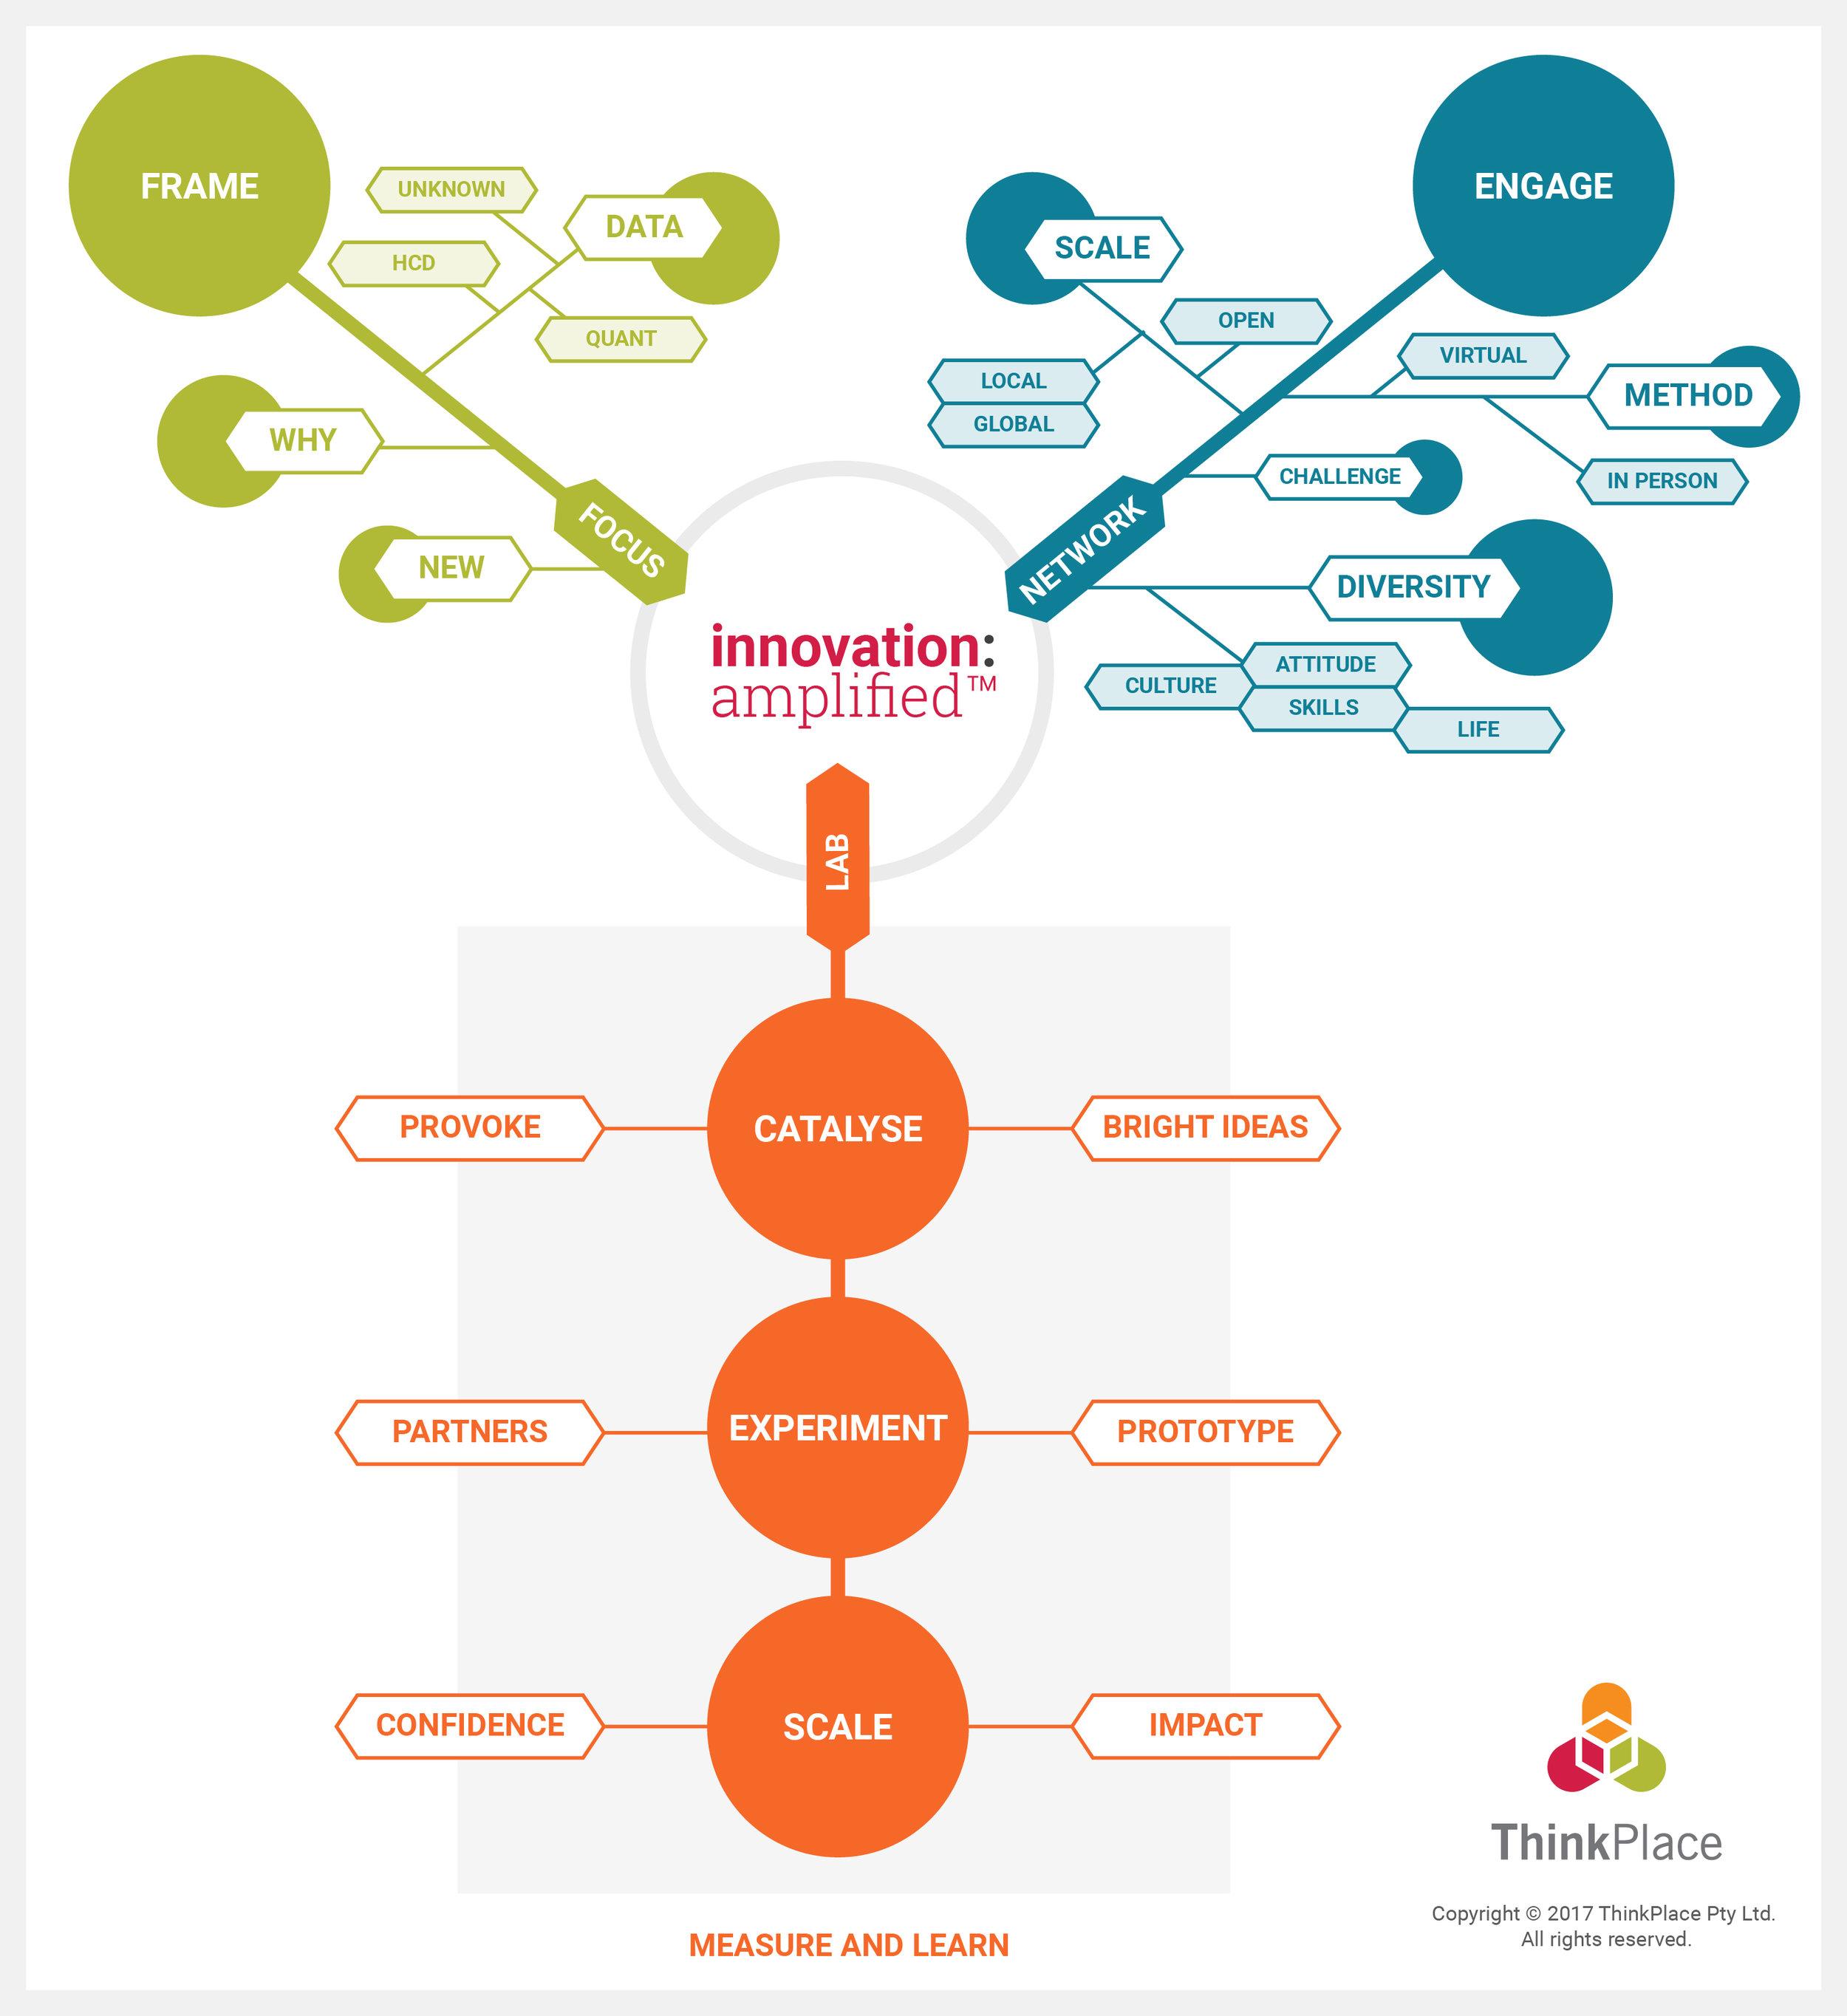 ThinkPlace-Innovation-Amplified-Model-01.jpg